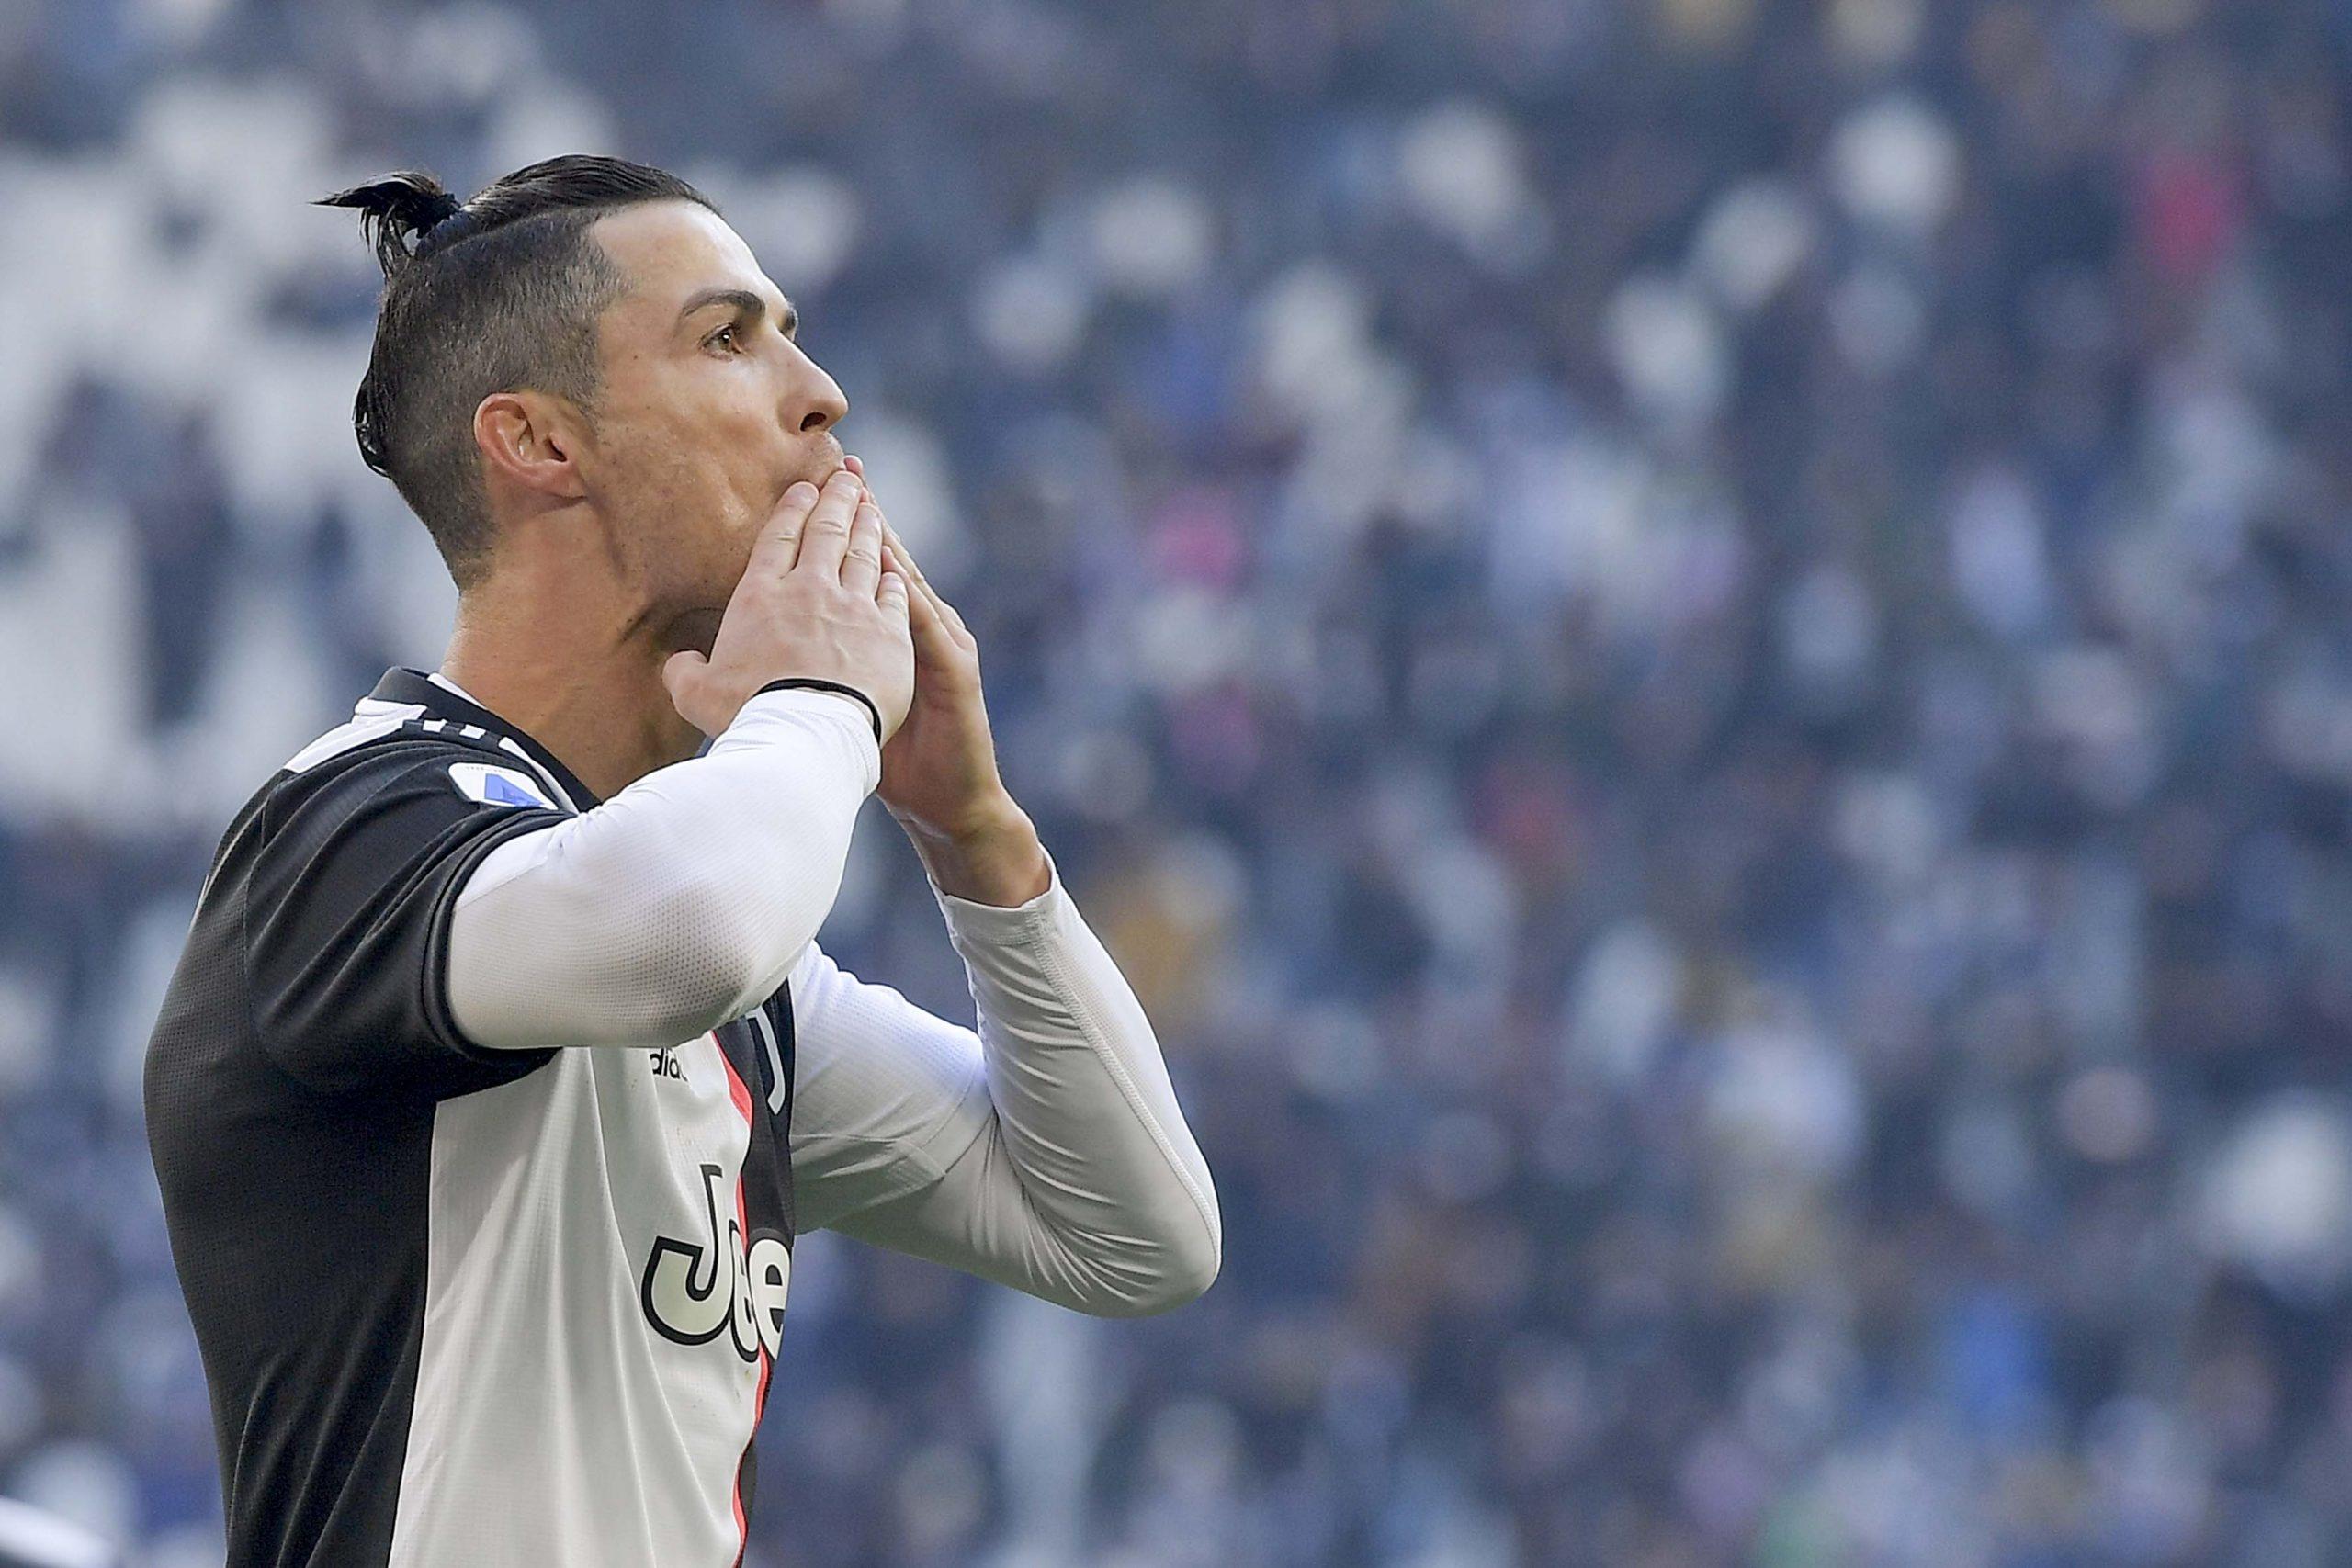 Cristiano Ronaldo turns 35